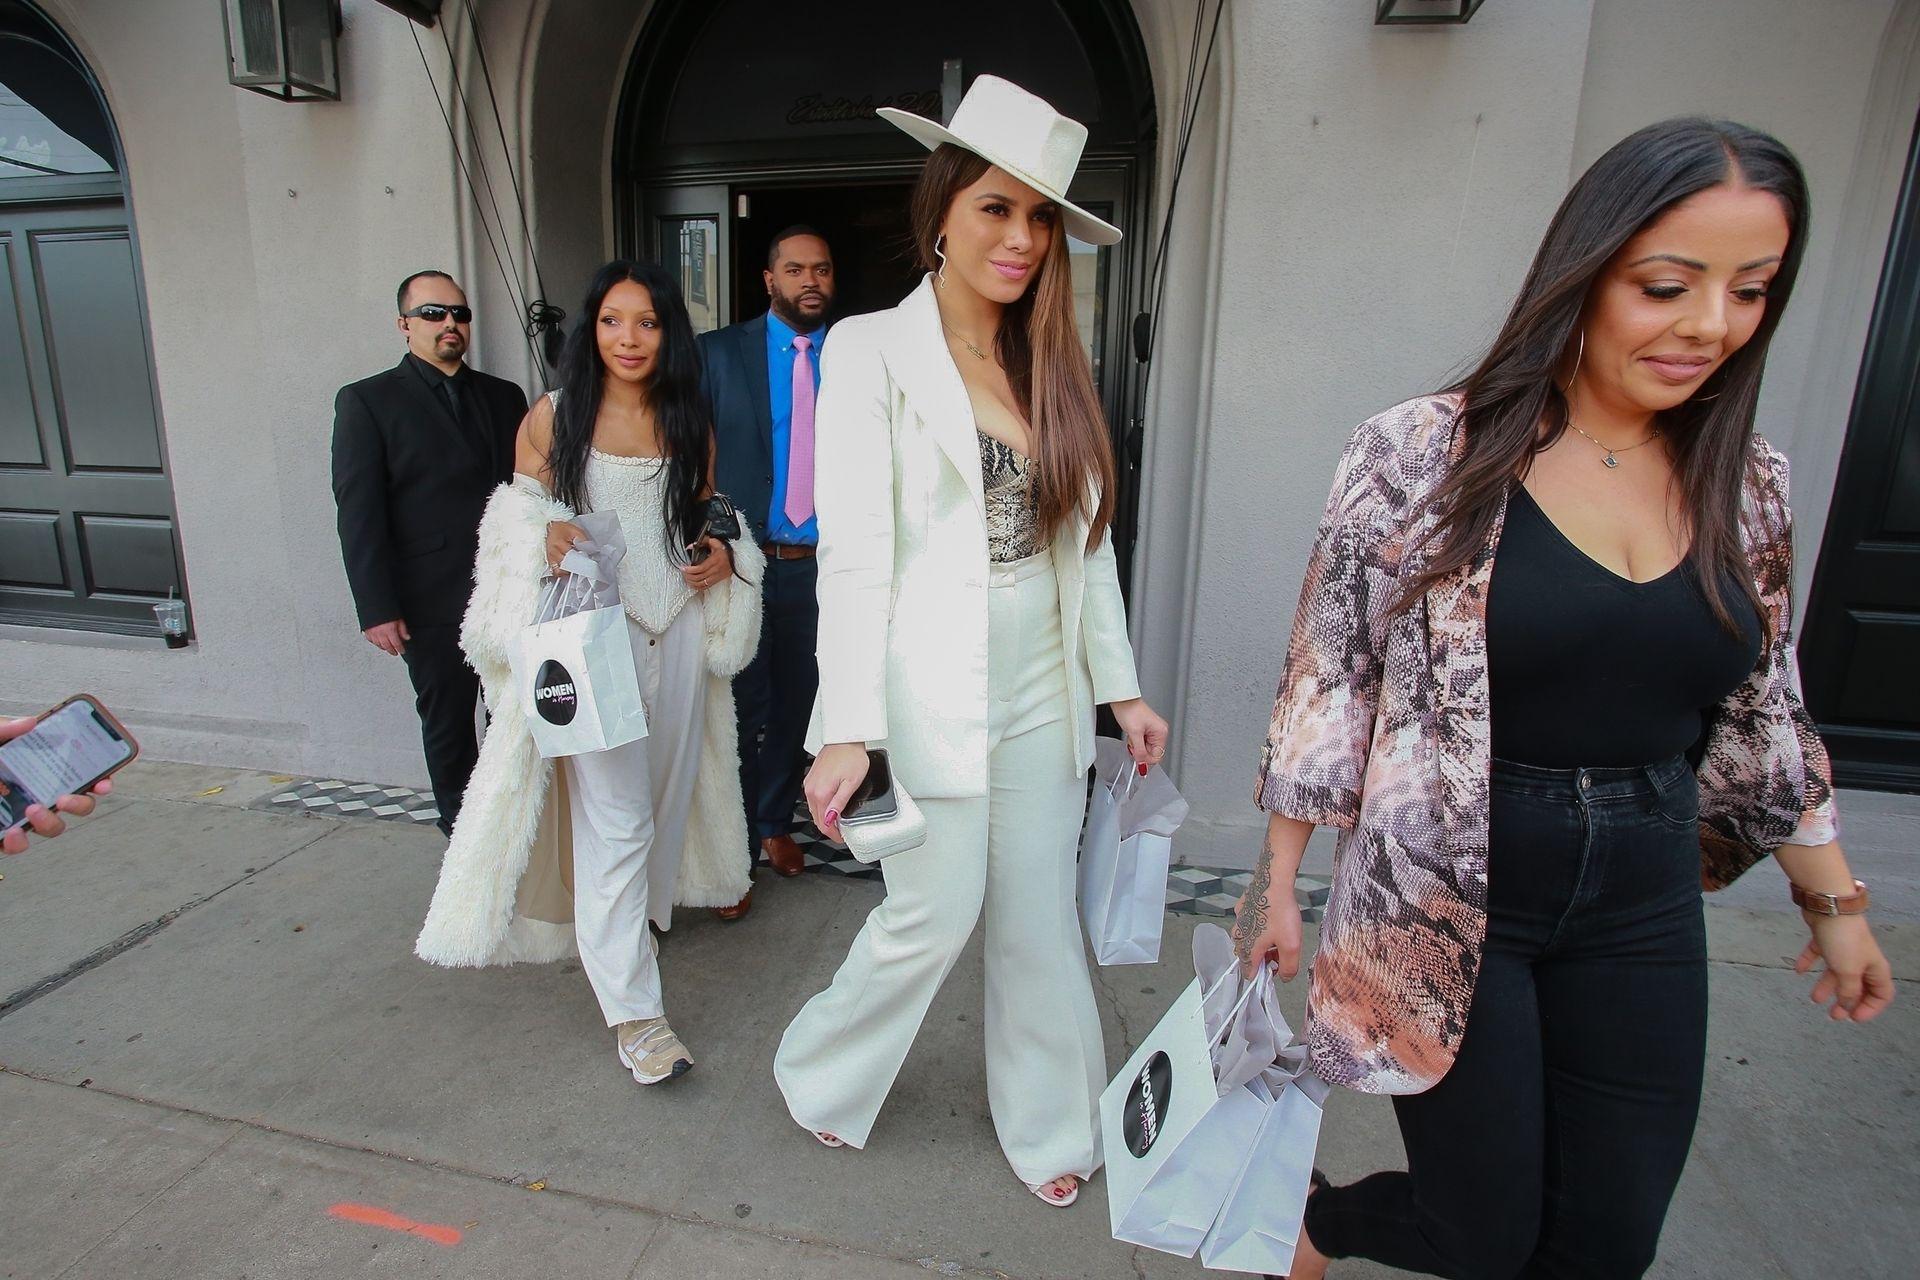 Dinah Jane Departs The Women In Harmony Pre Grammy Luncheon 0013